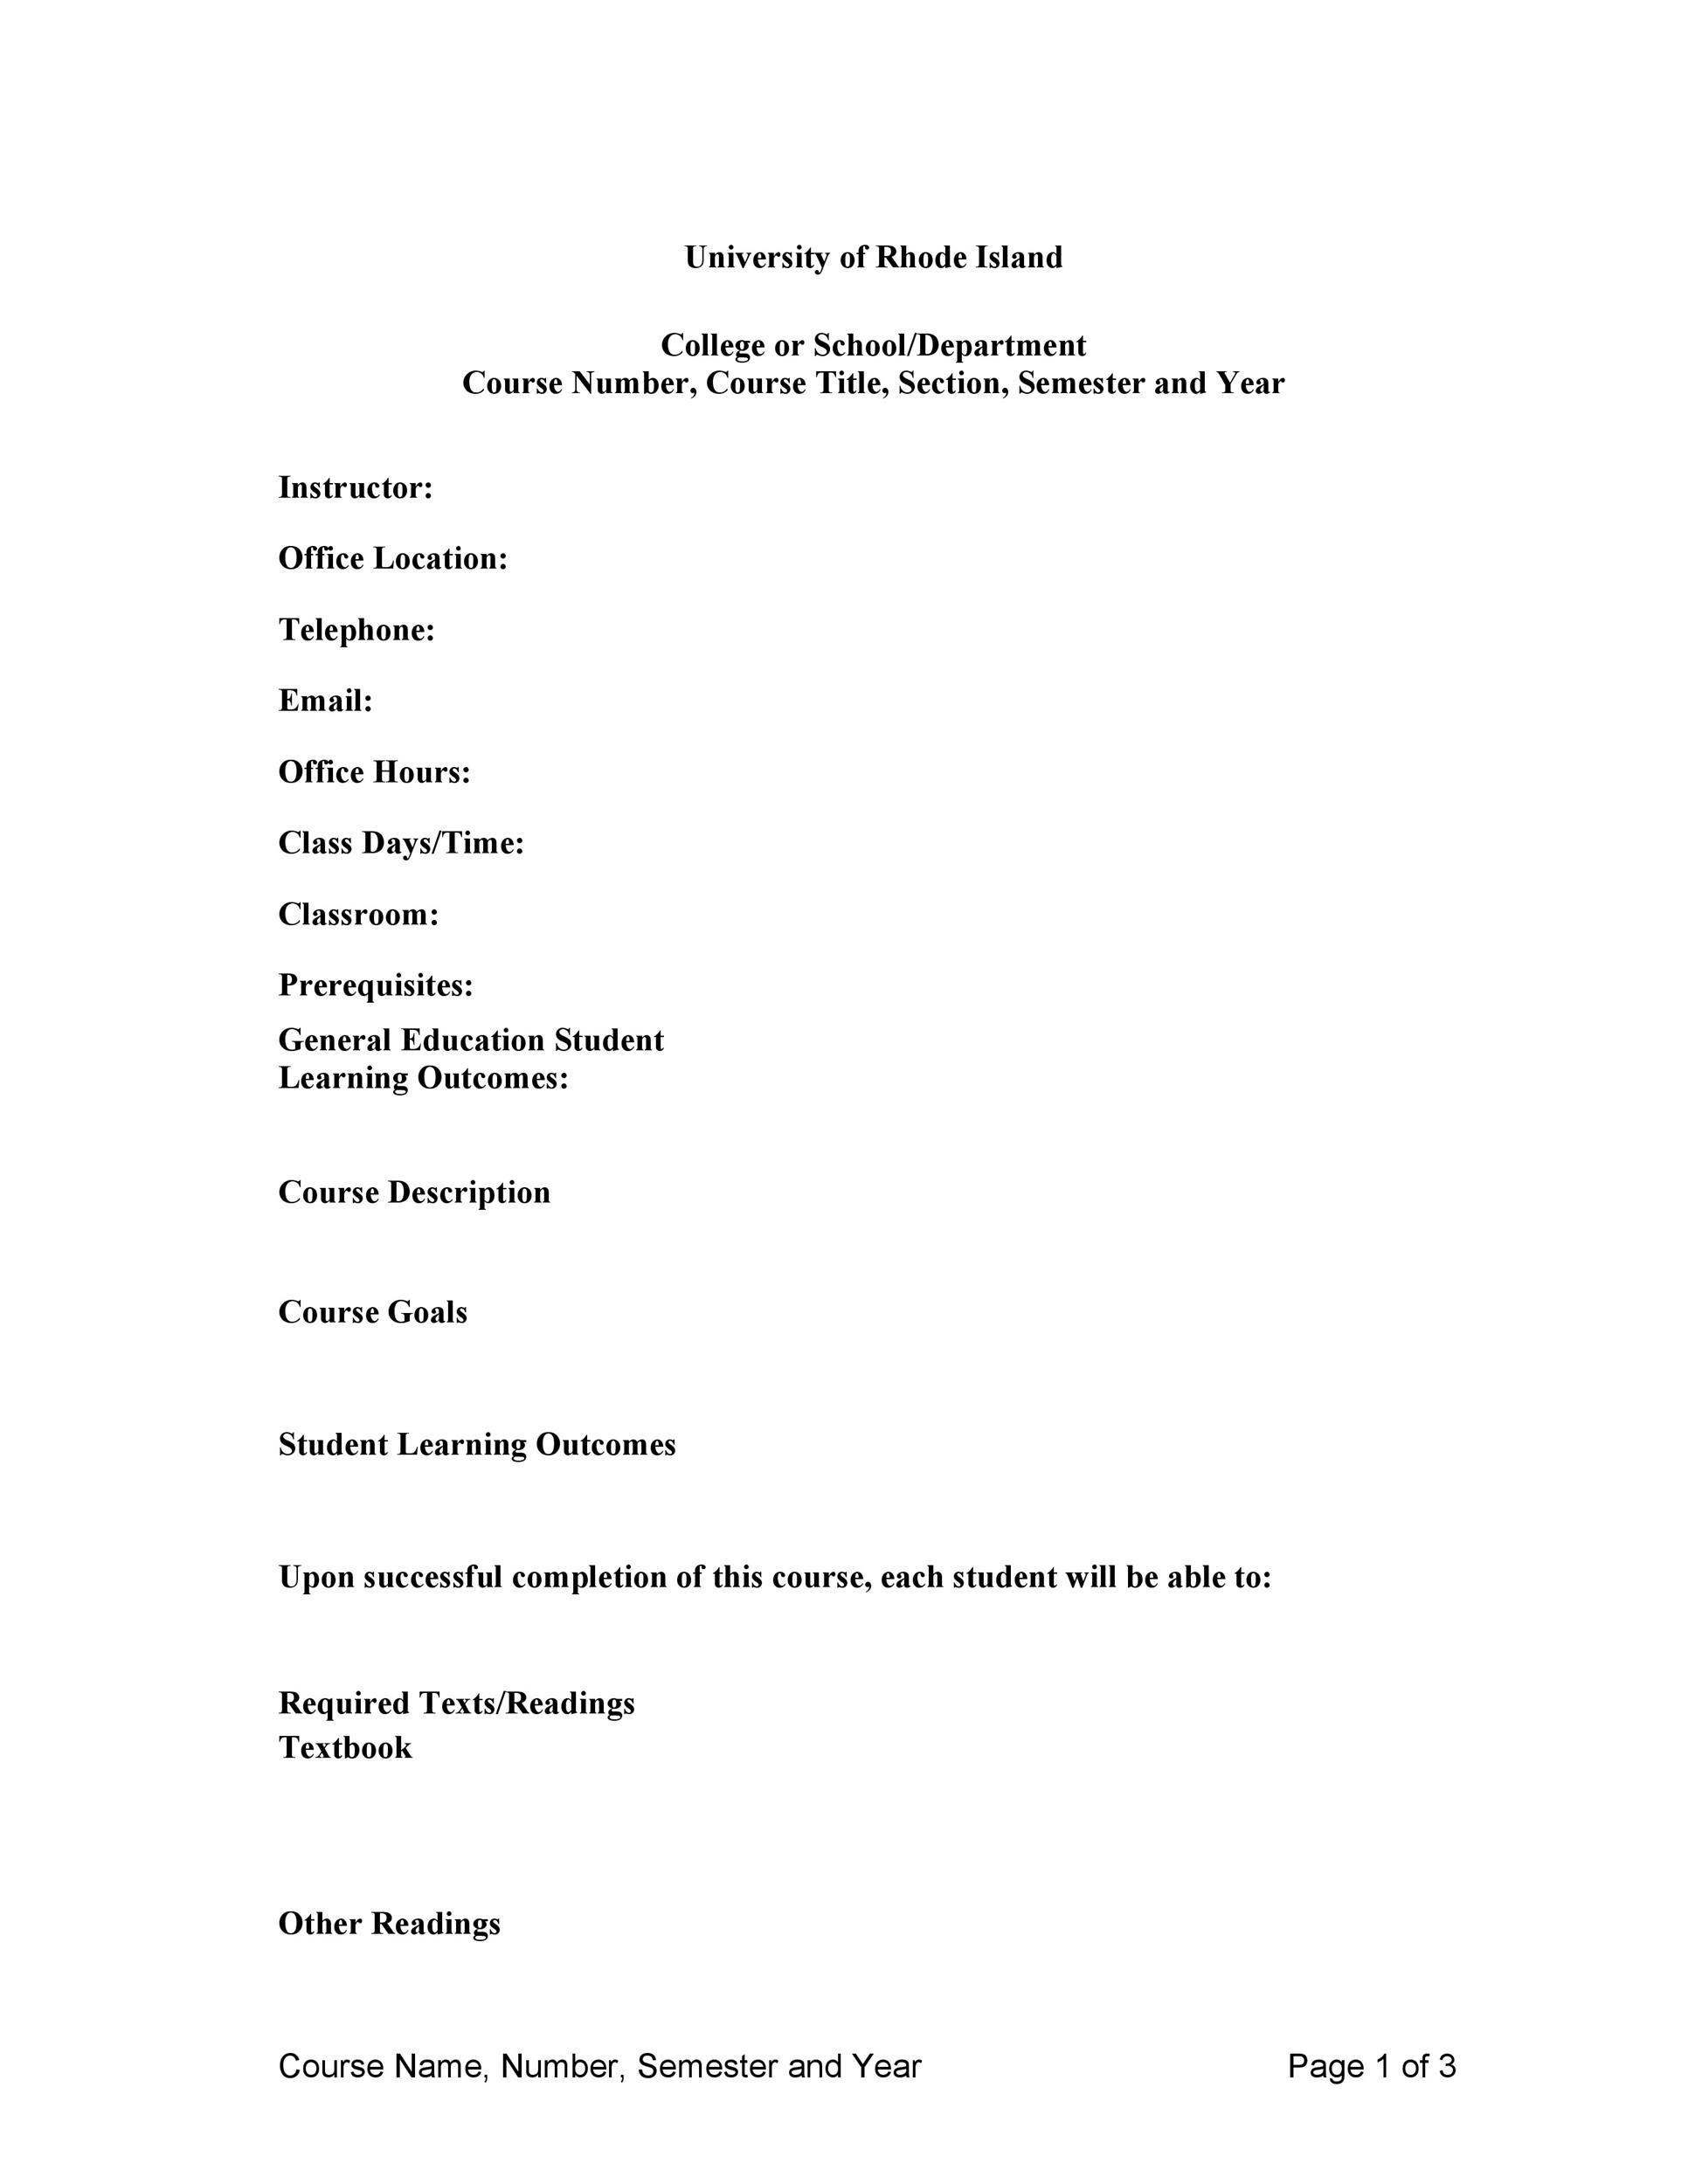 Free sylabus template 02